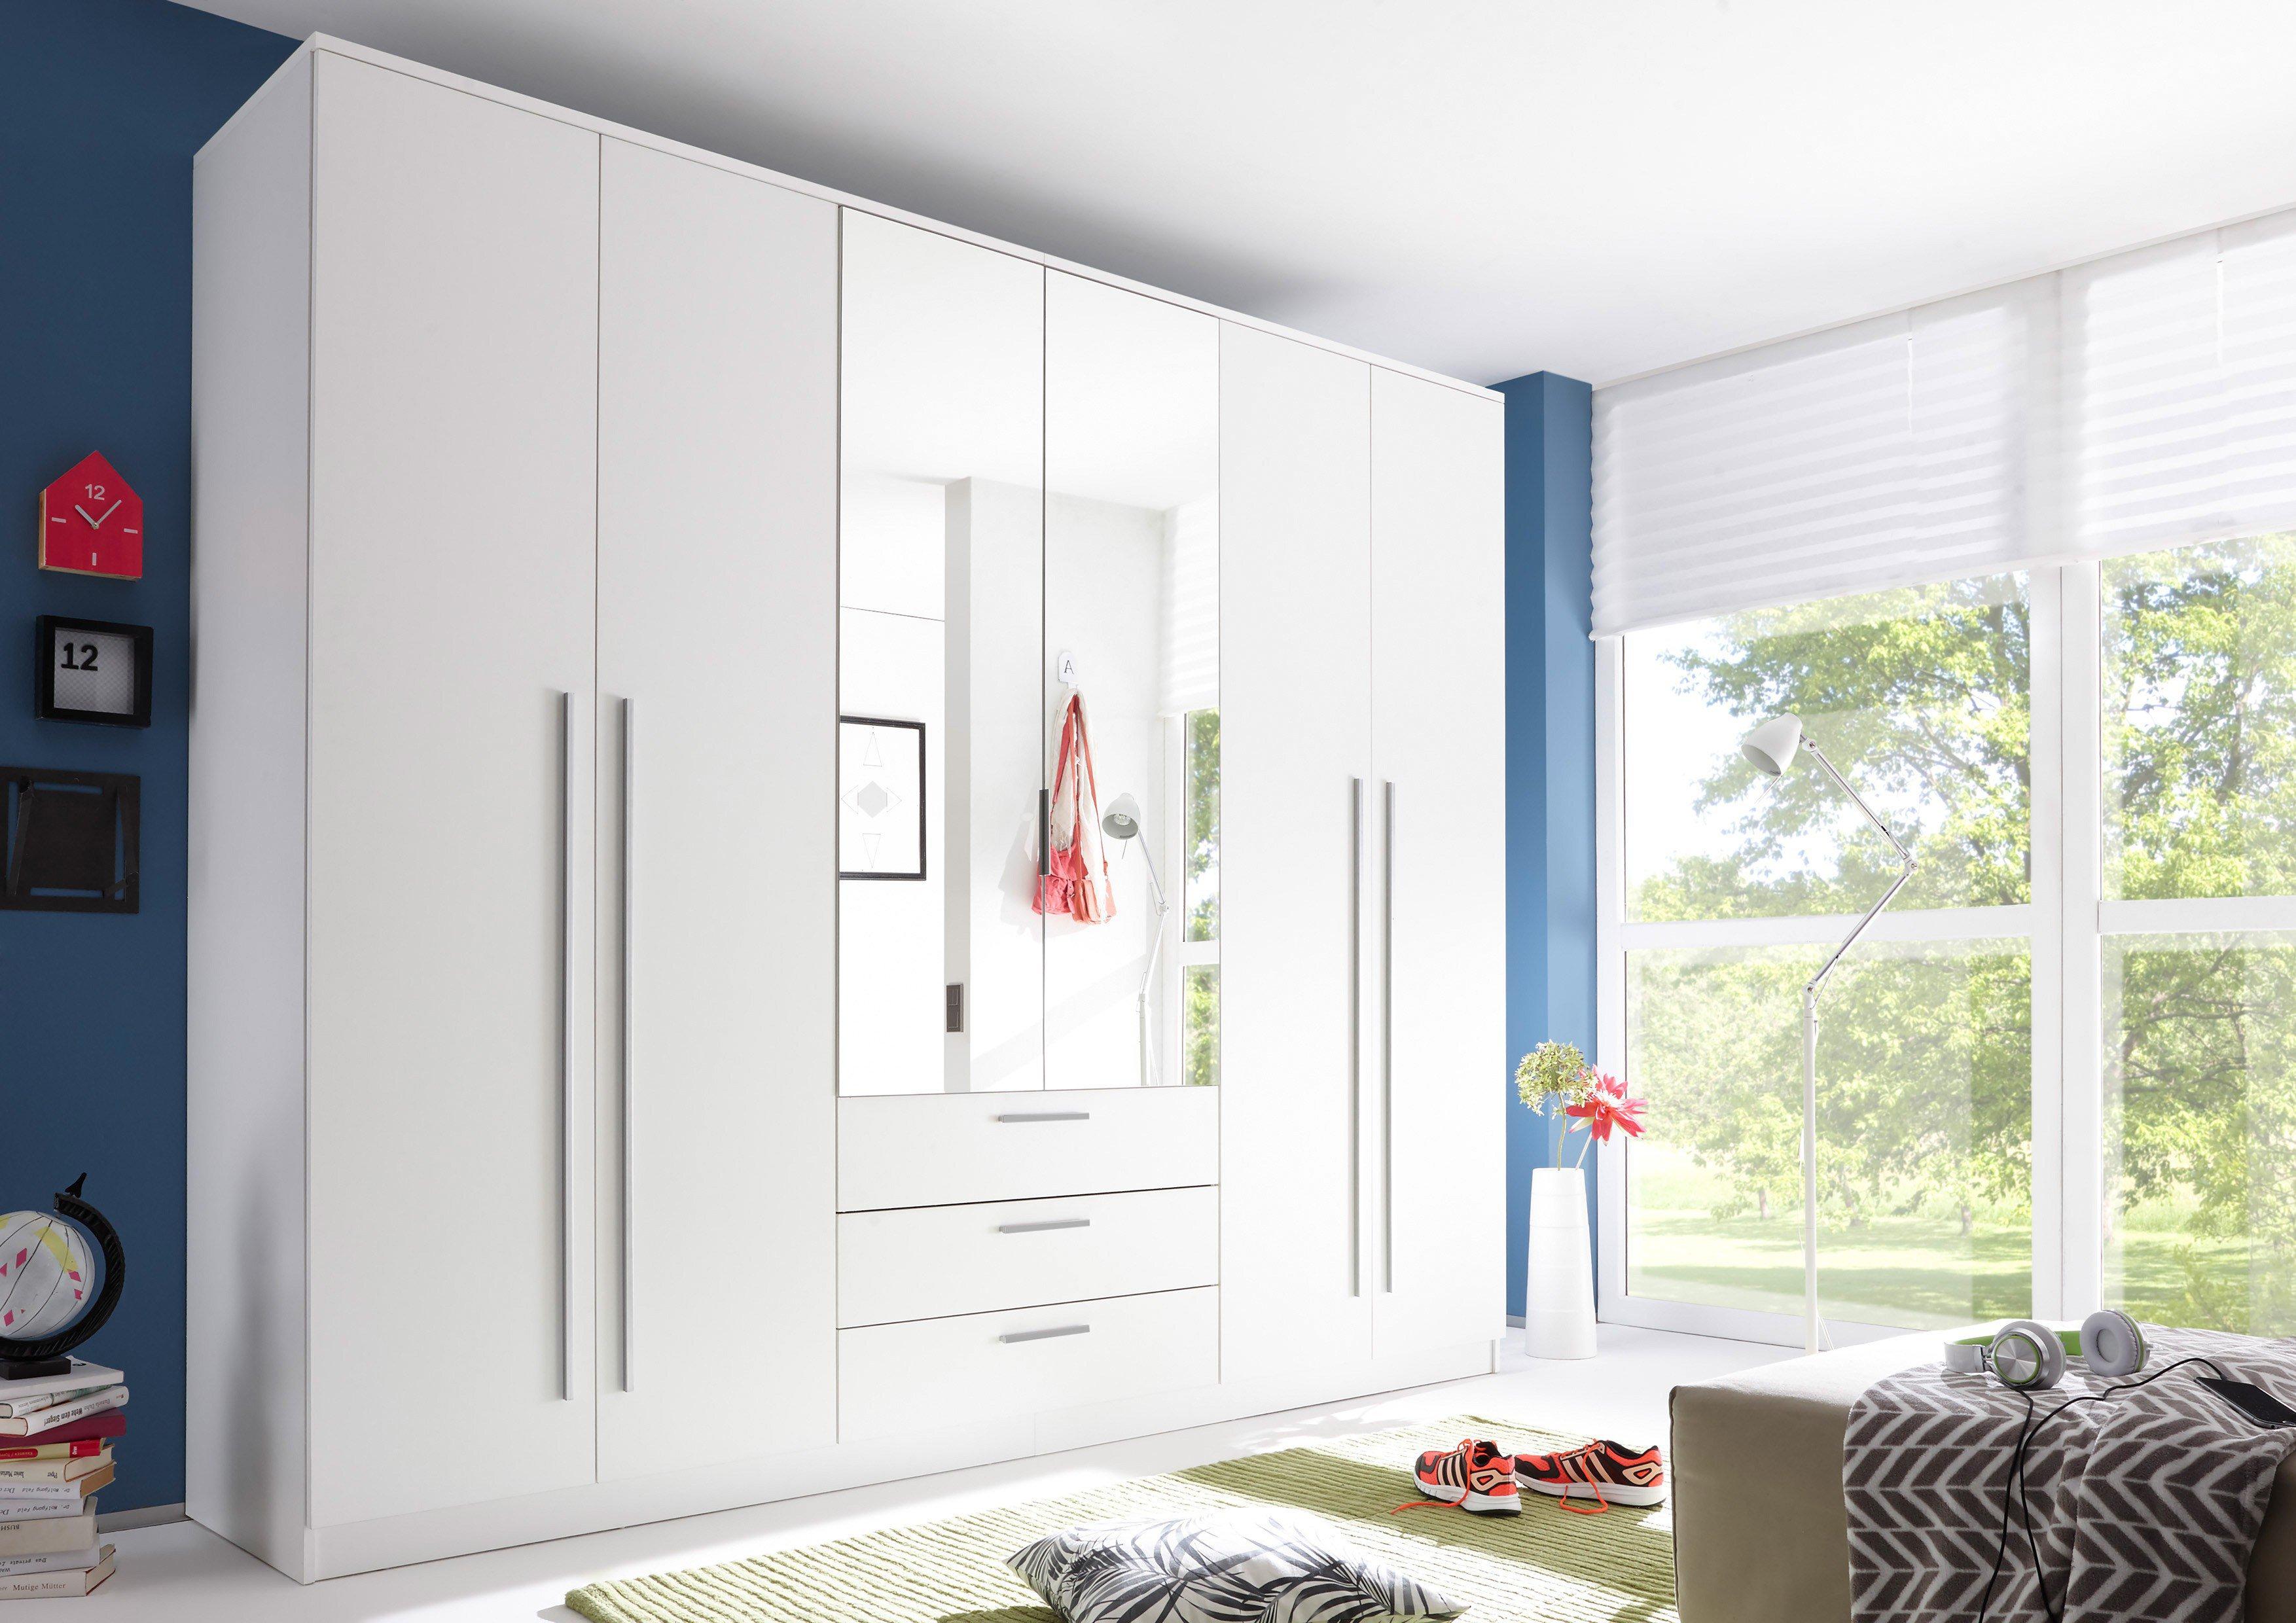 m bel auf raten online bestellen. Black Bedroom Furniture Sets. Home Design Ideas